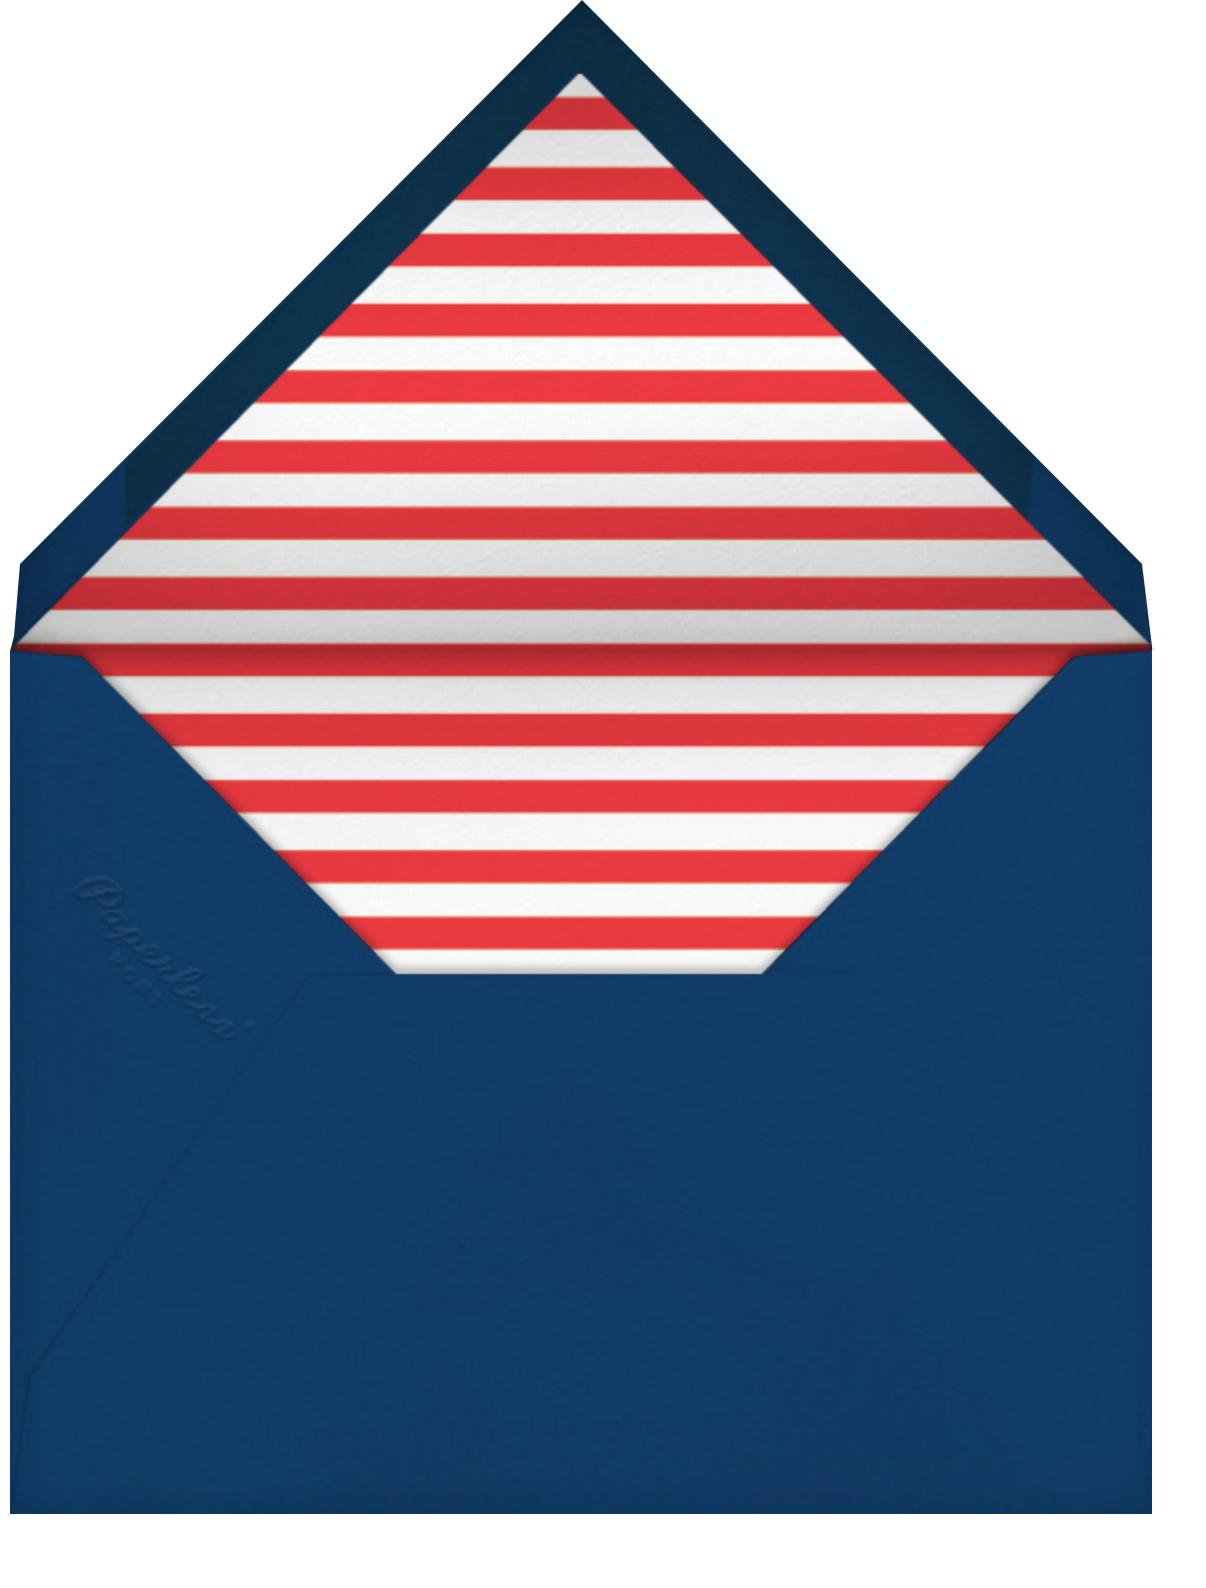 Boatloads - Mr. Boddington's Studio - Thank you - envelope back